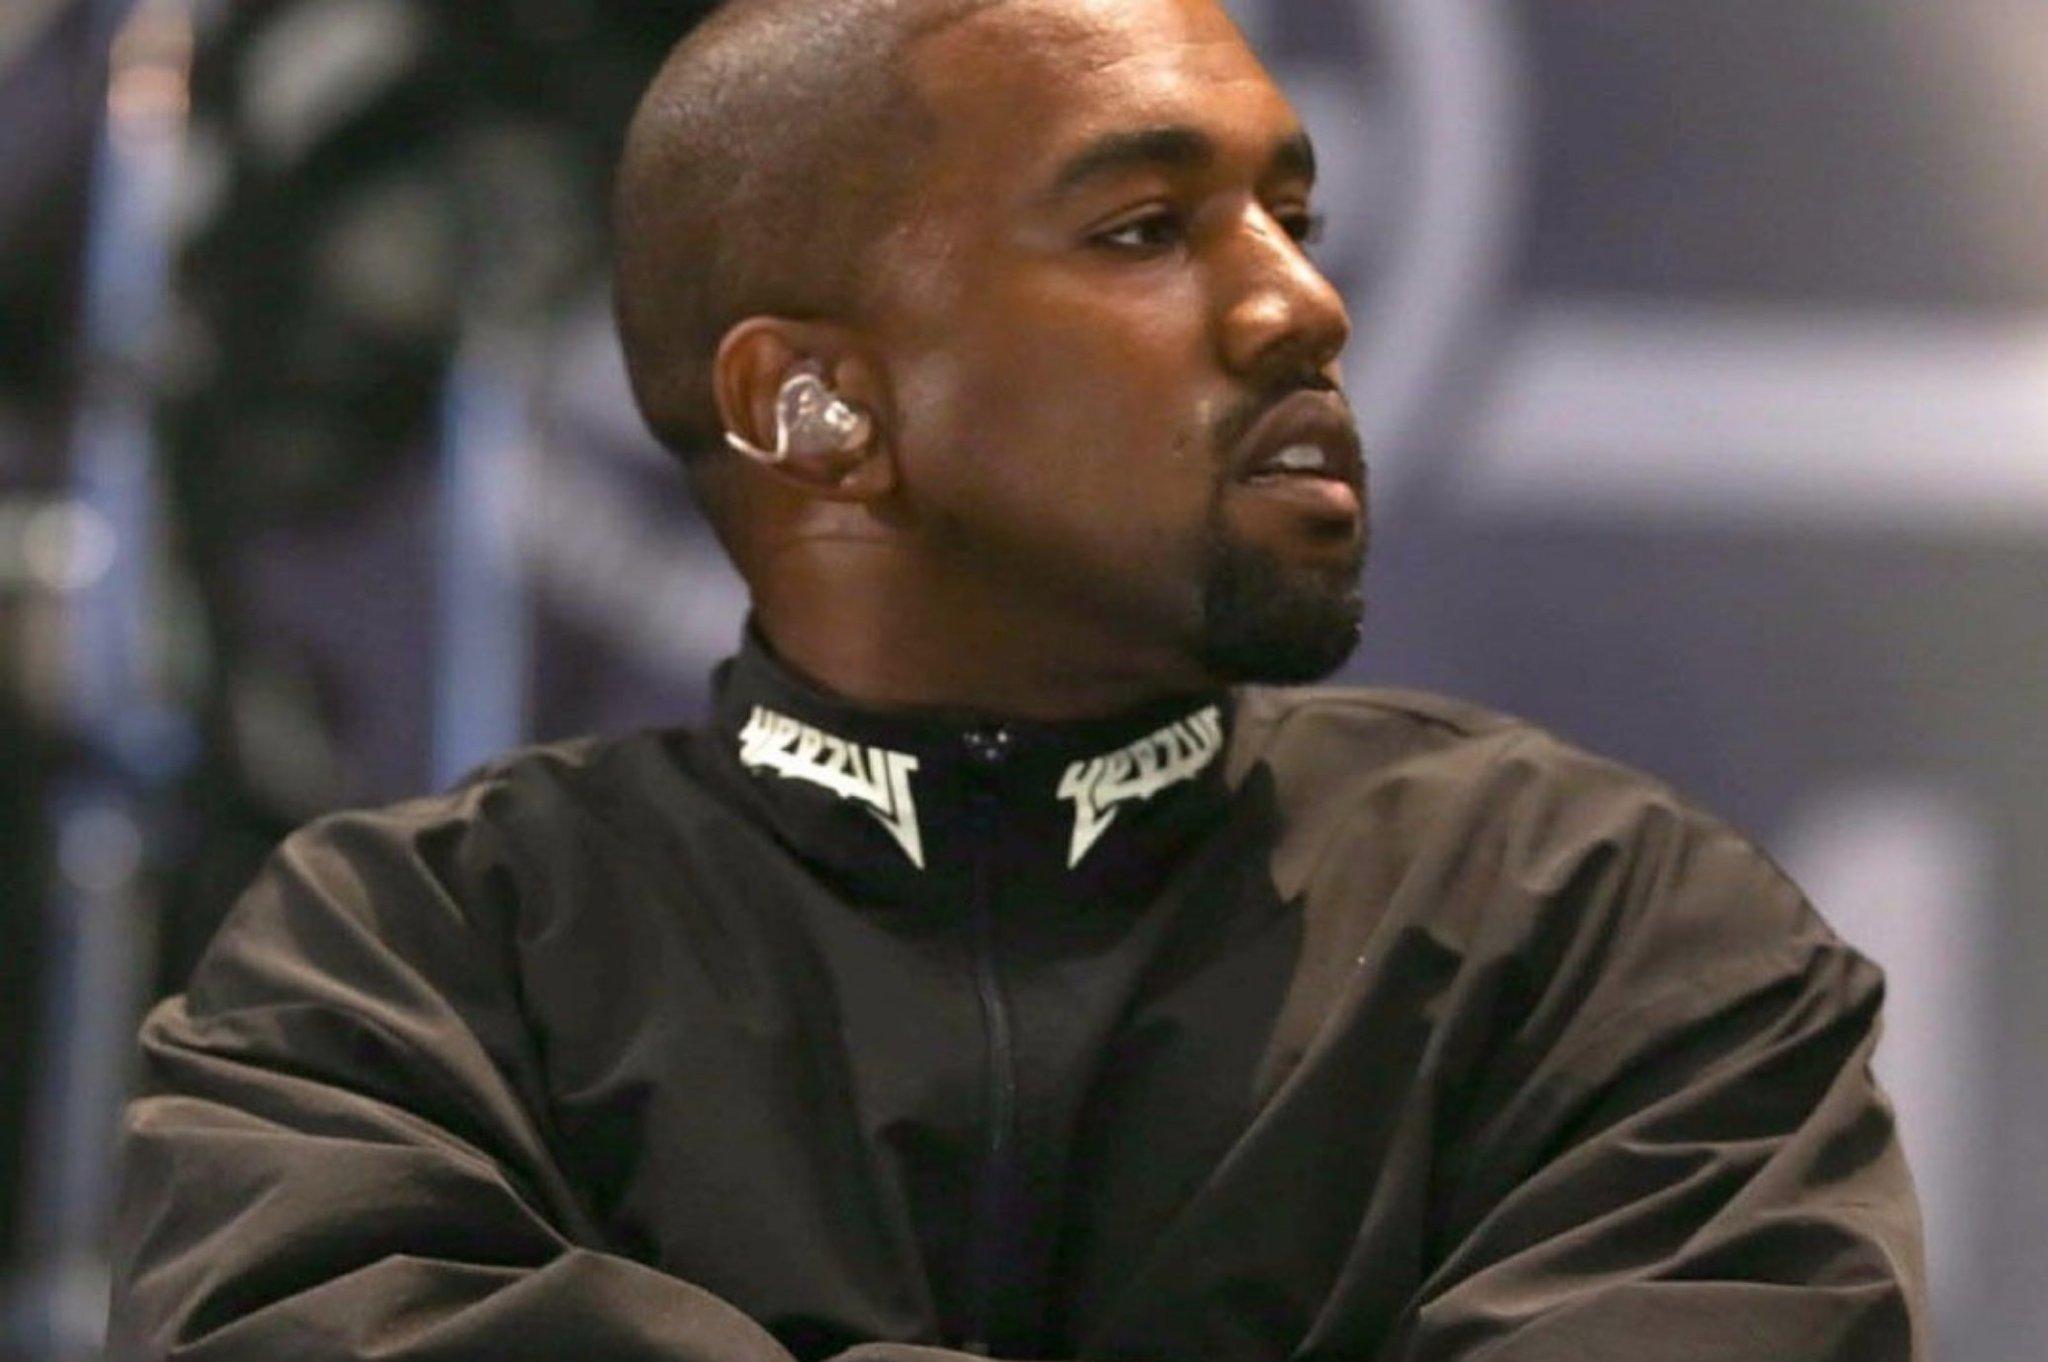 Guest Verses: Featuring Kanye West https://t.co/NprQeHVEoe #TIDAL https://t.co/q7hFkZlcmP